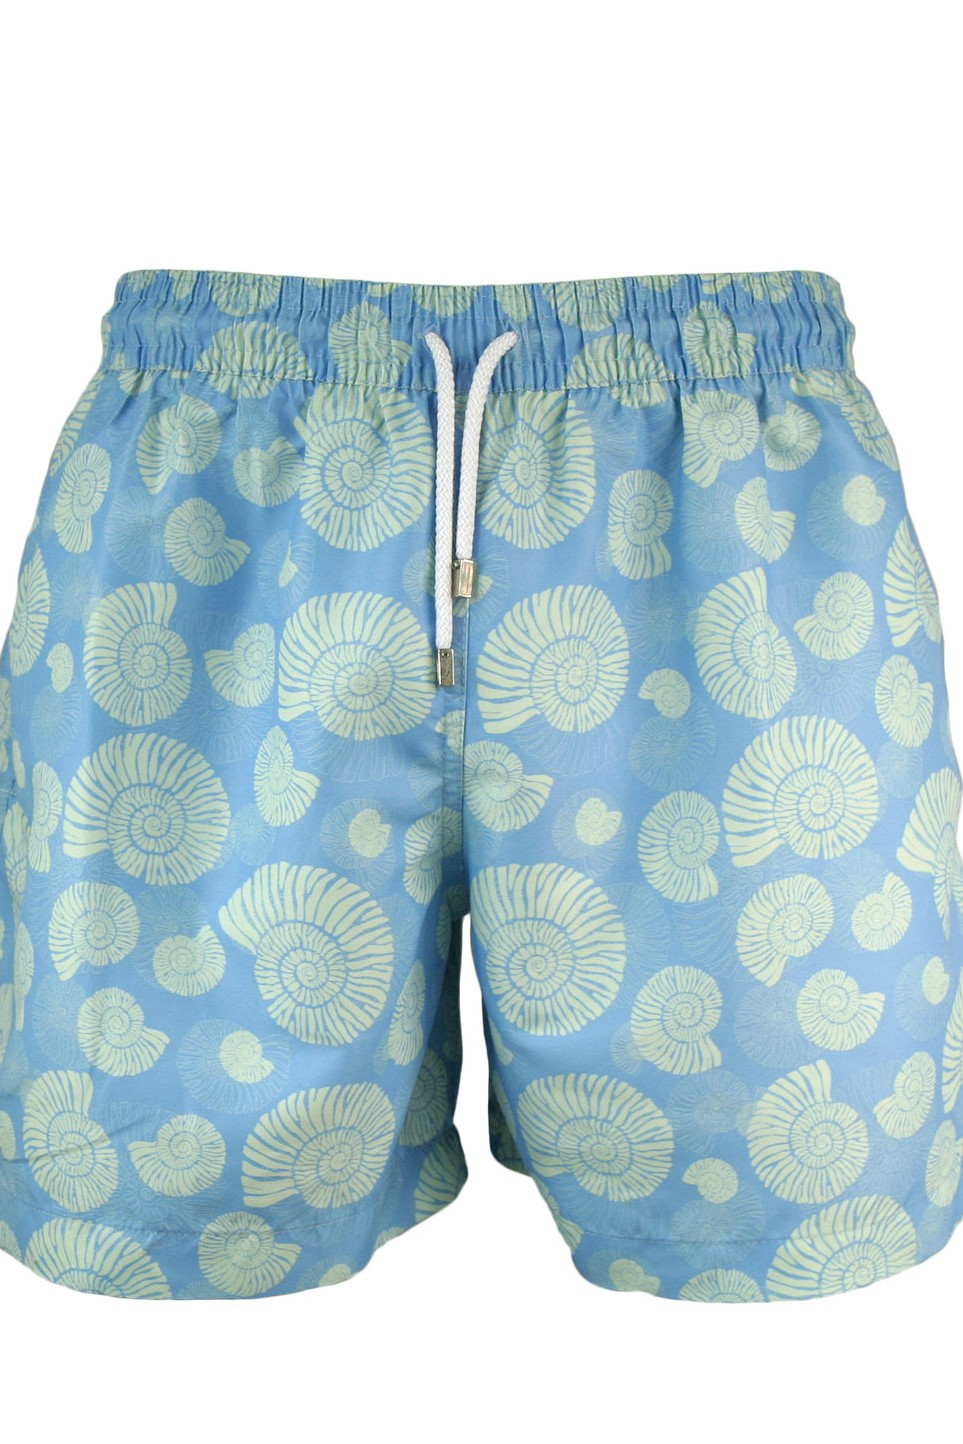 3dcf51cf89 Swim Trunk Men Pablo blue Shells on light Blue – Marina & Carrara